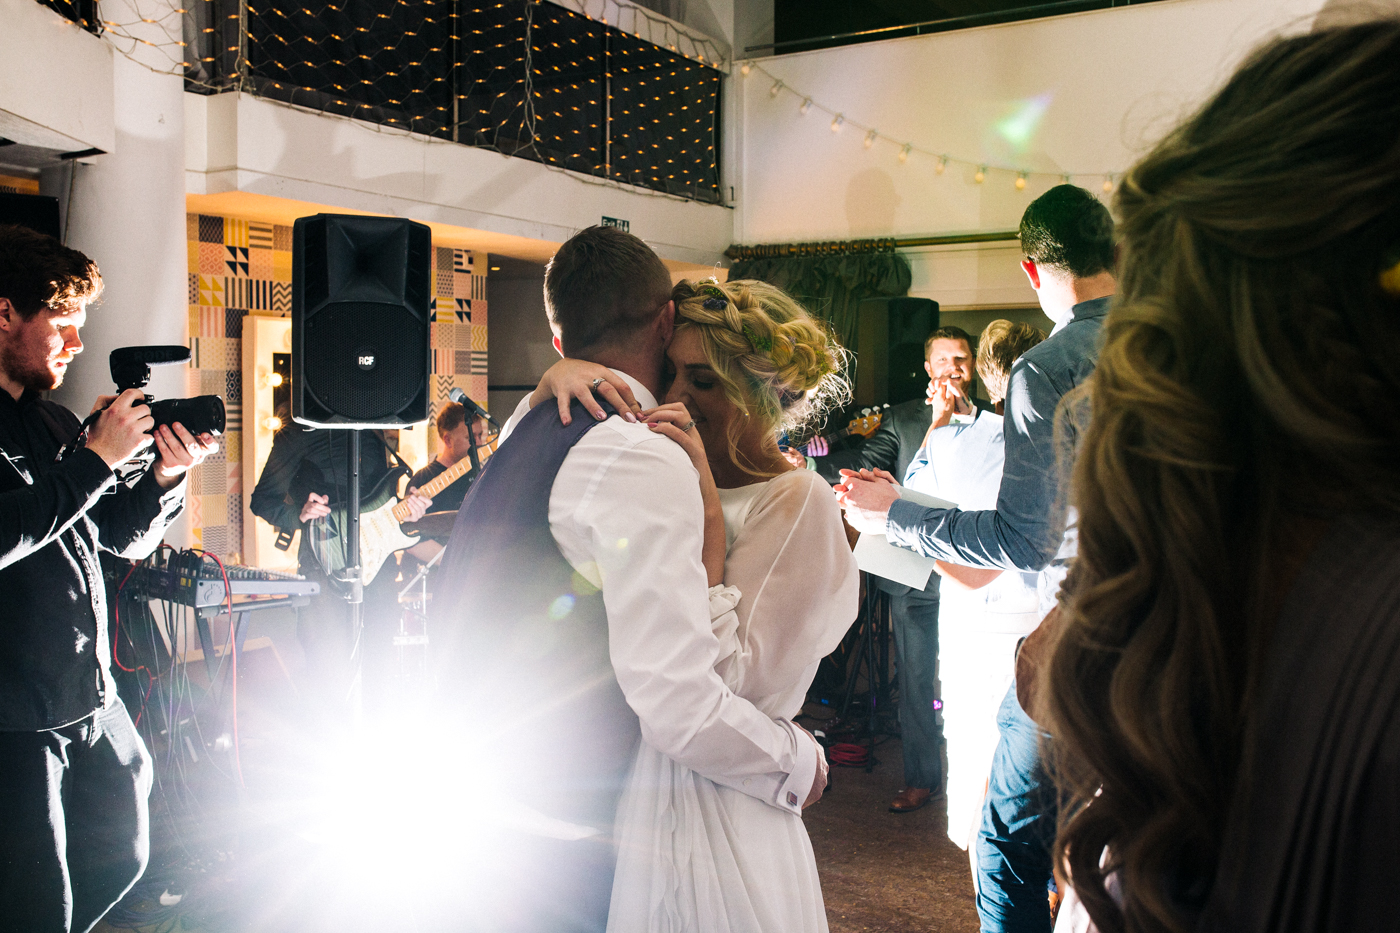 teesside-middlesbrough-north-east-wedding-photographer-creative-wedding-venues-0010.jpg